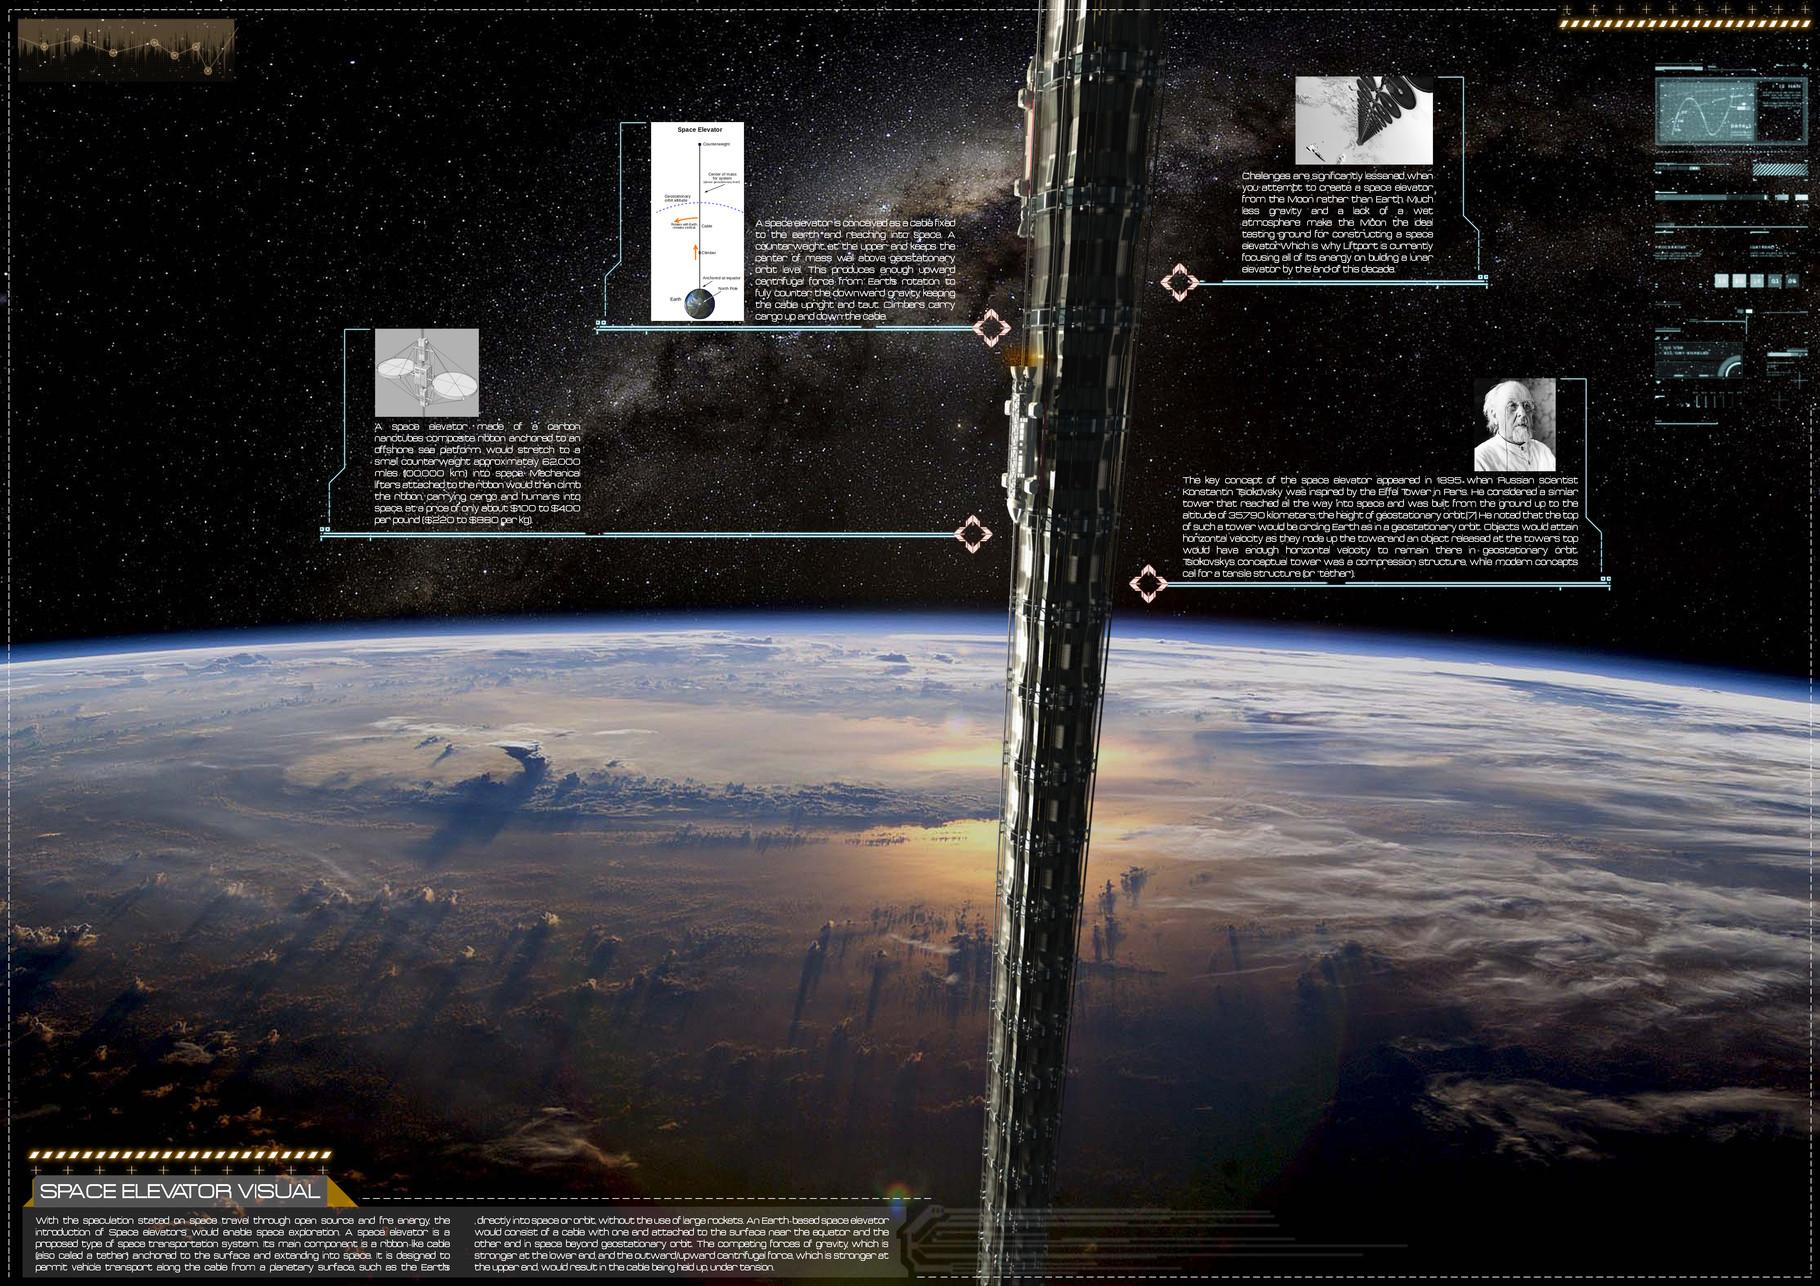 space elevator visual 1